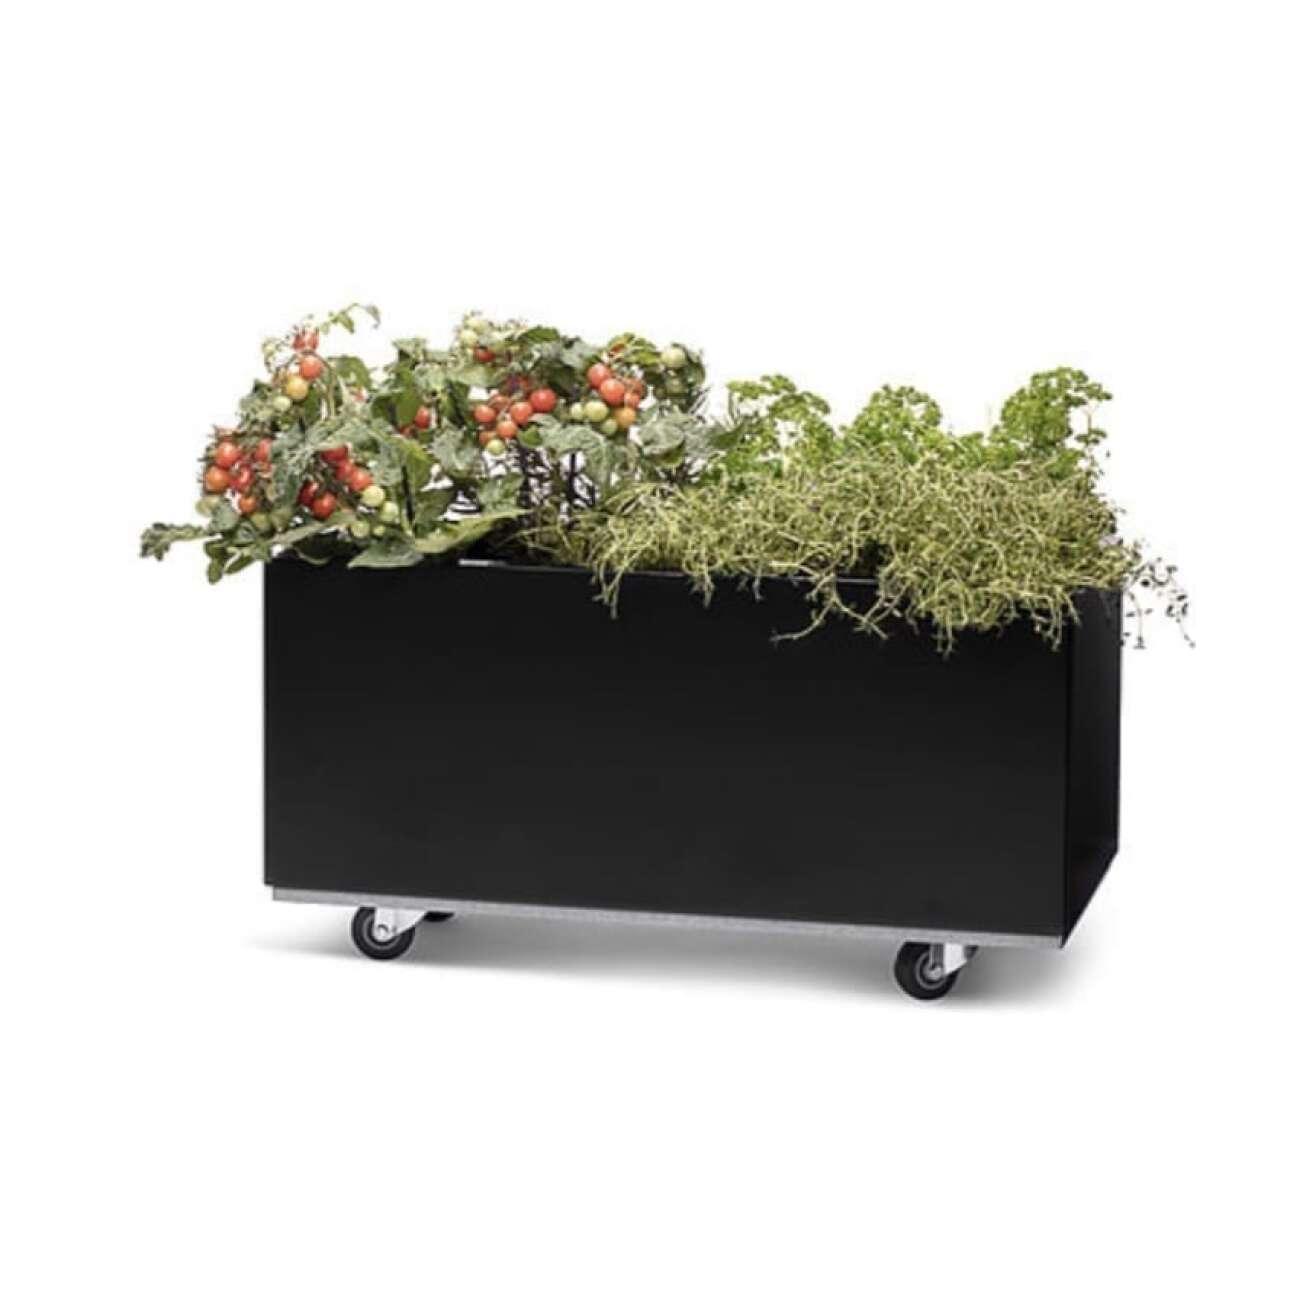 Plantekasse I Sort 60x60x25 Cm Med Bunn Og Hjul. Bedd (40-008s) Hagemøbler og utemøbler - Fine design